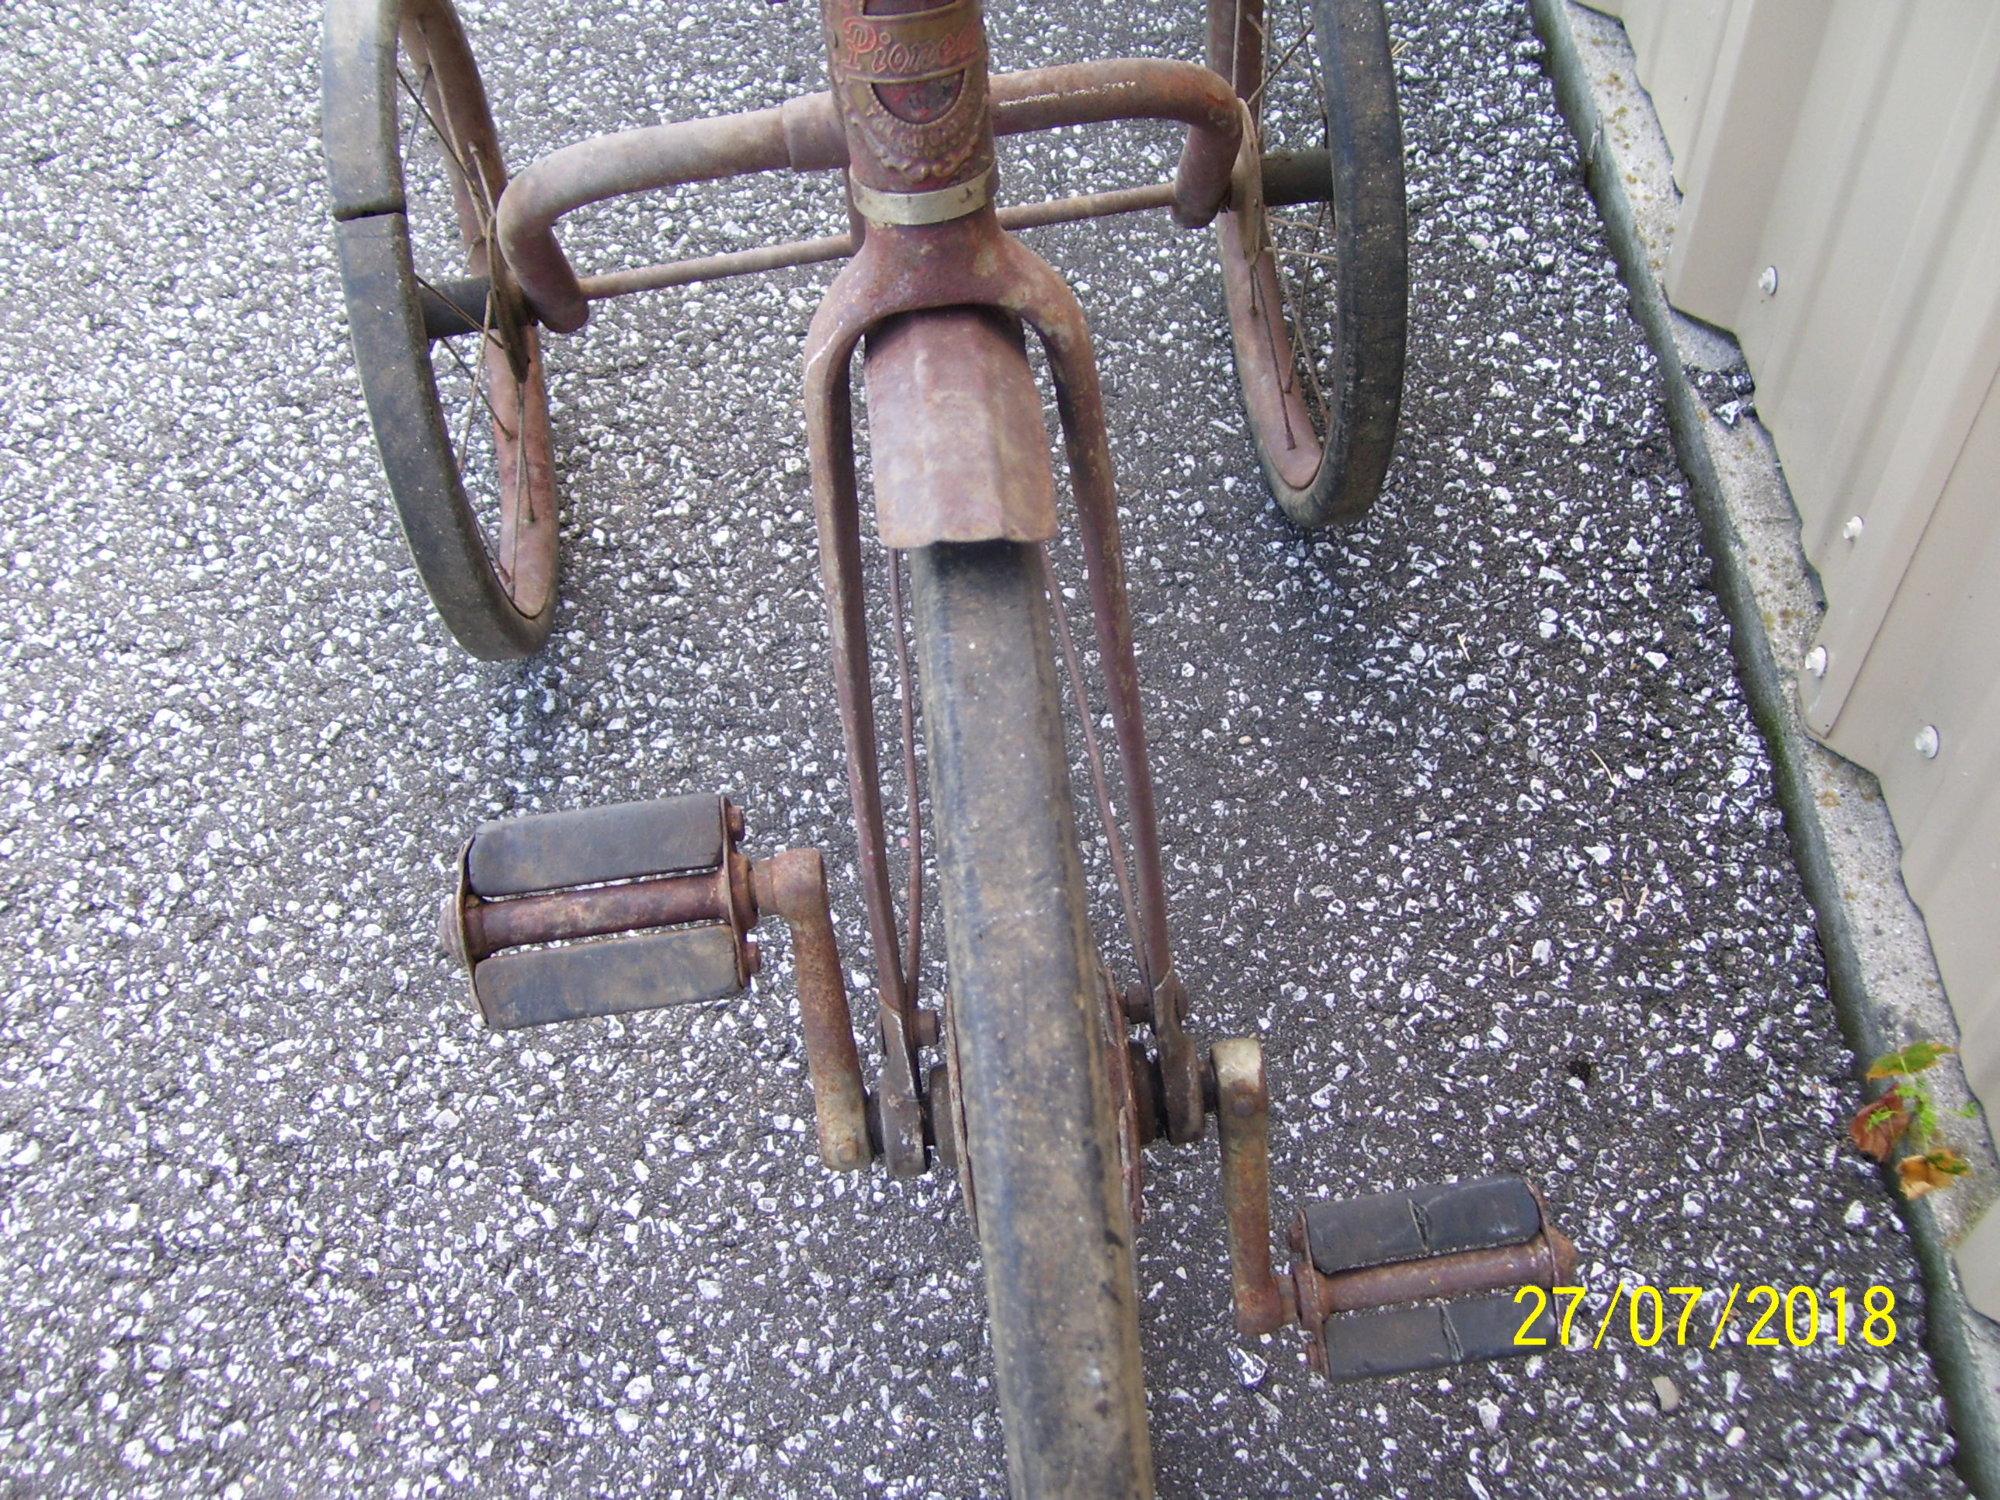 evans bikes 006.JPG